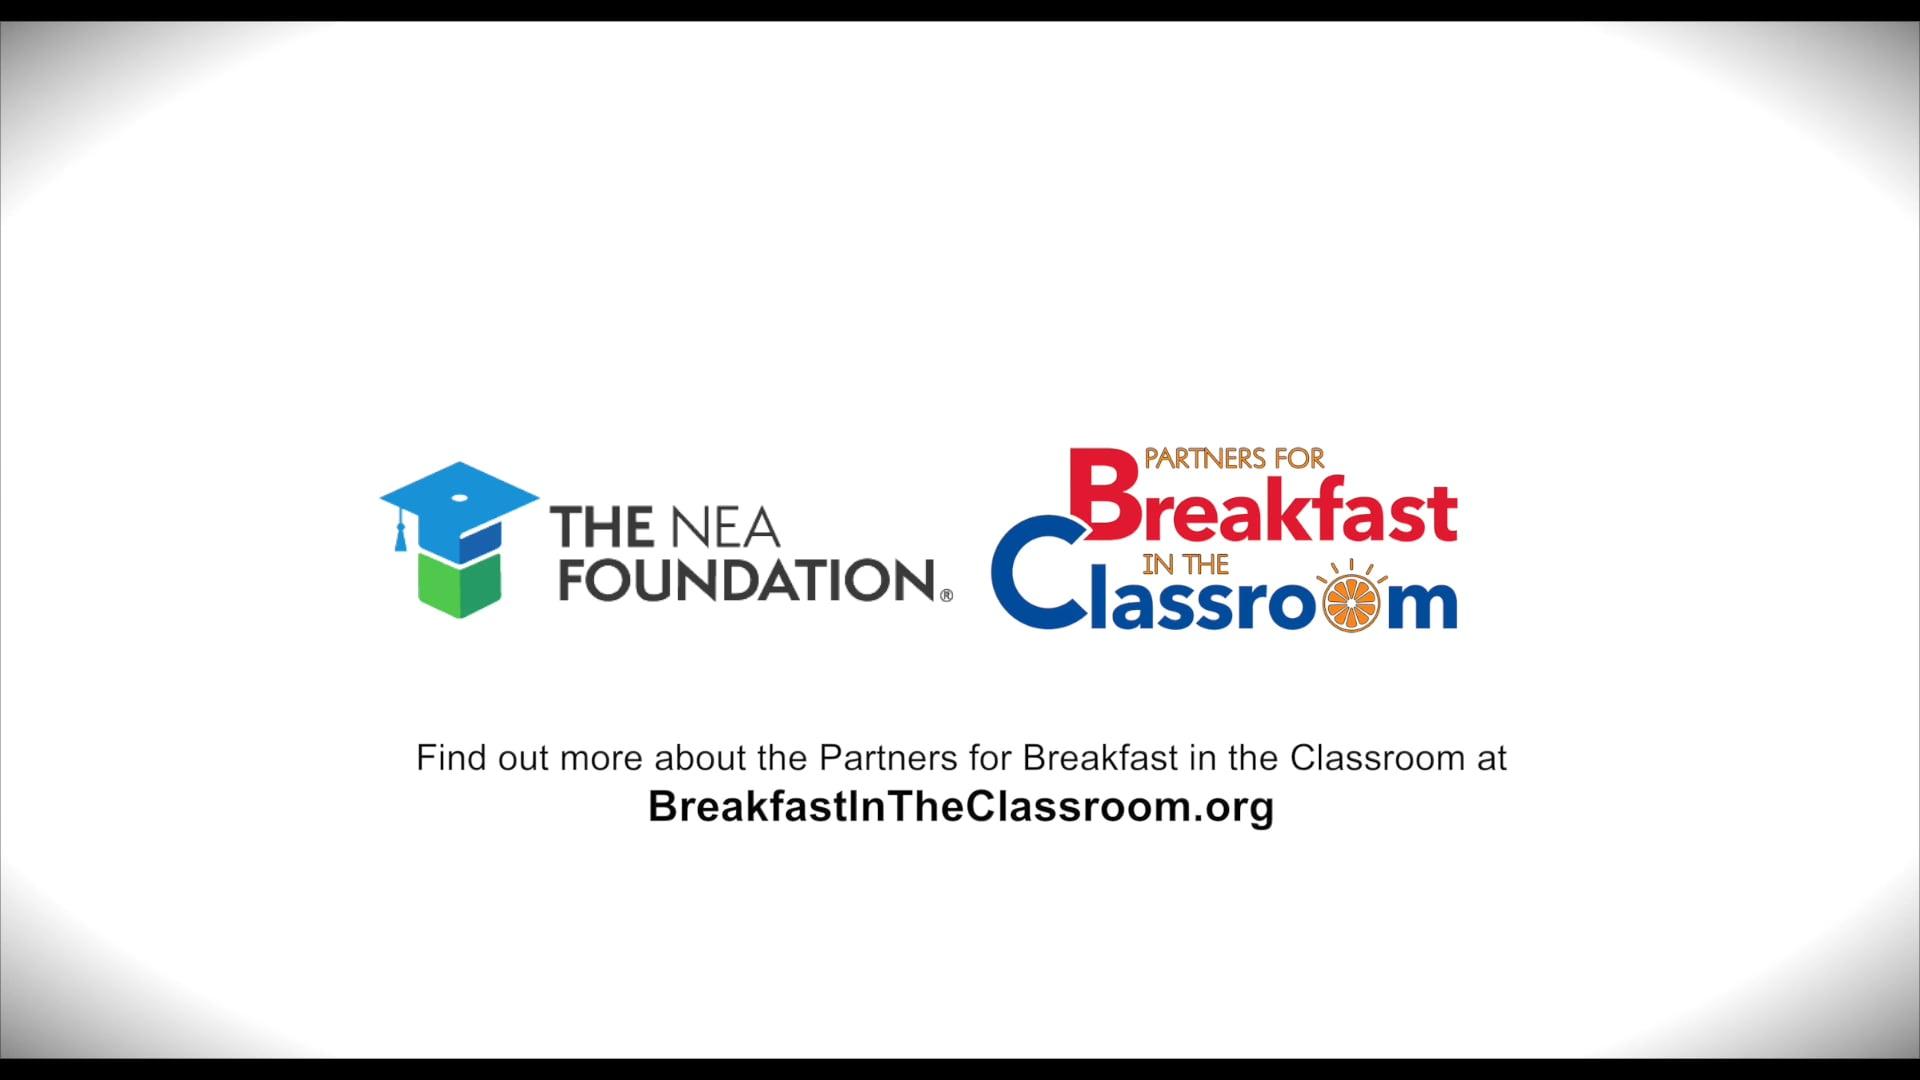 NEA FOUNDATION - BREAKFAST IN THE CLASSROOM